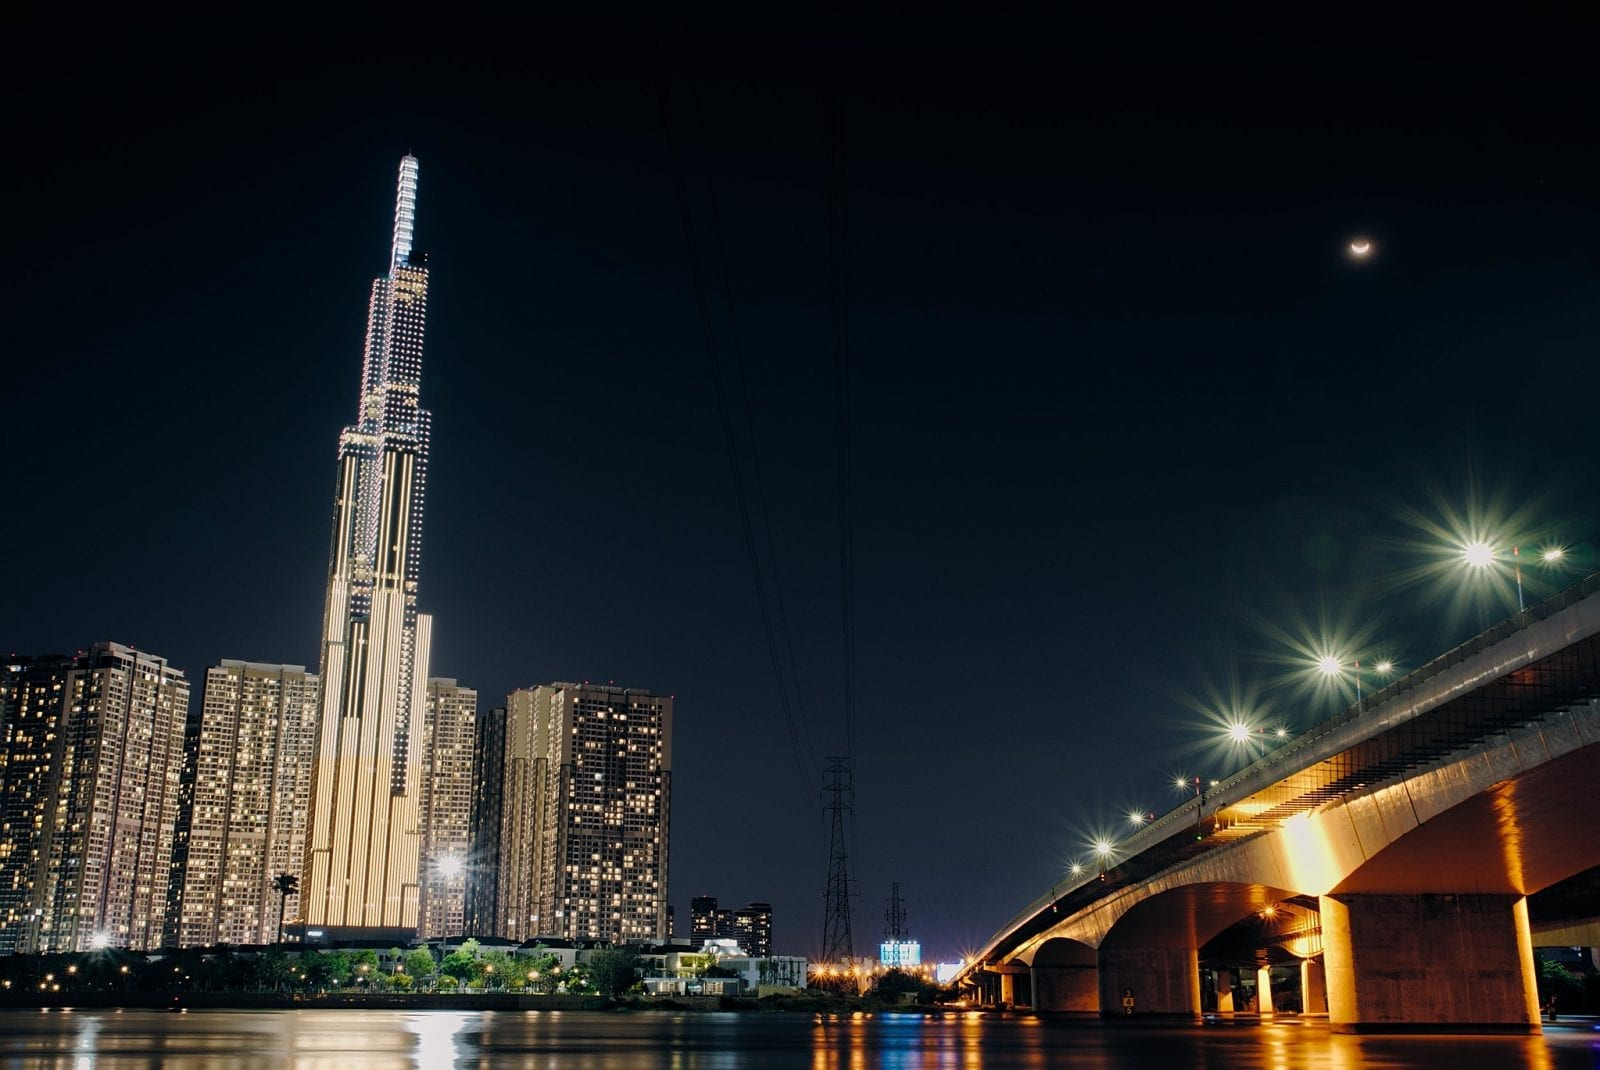 Image of Landmark 81 illuminated at night